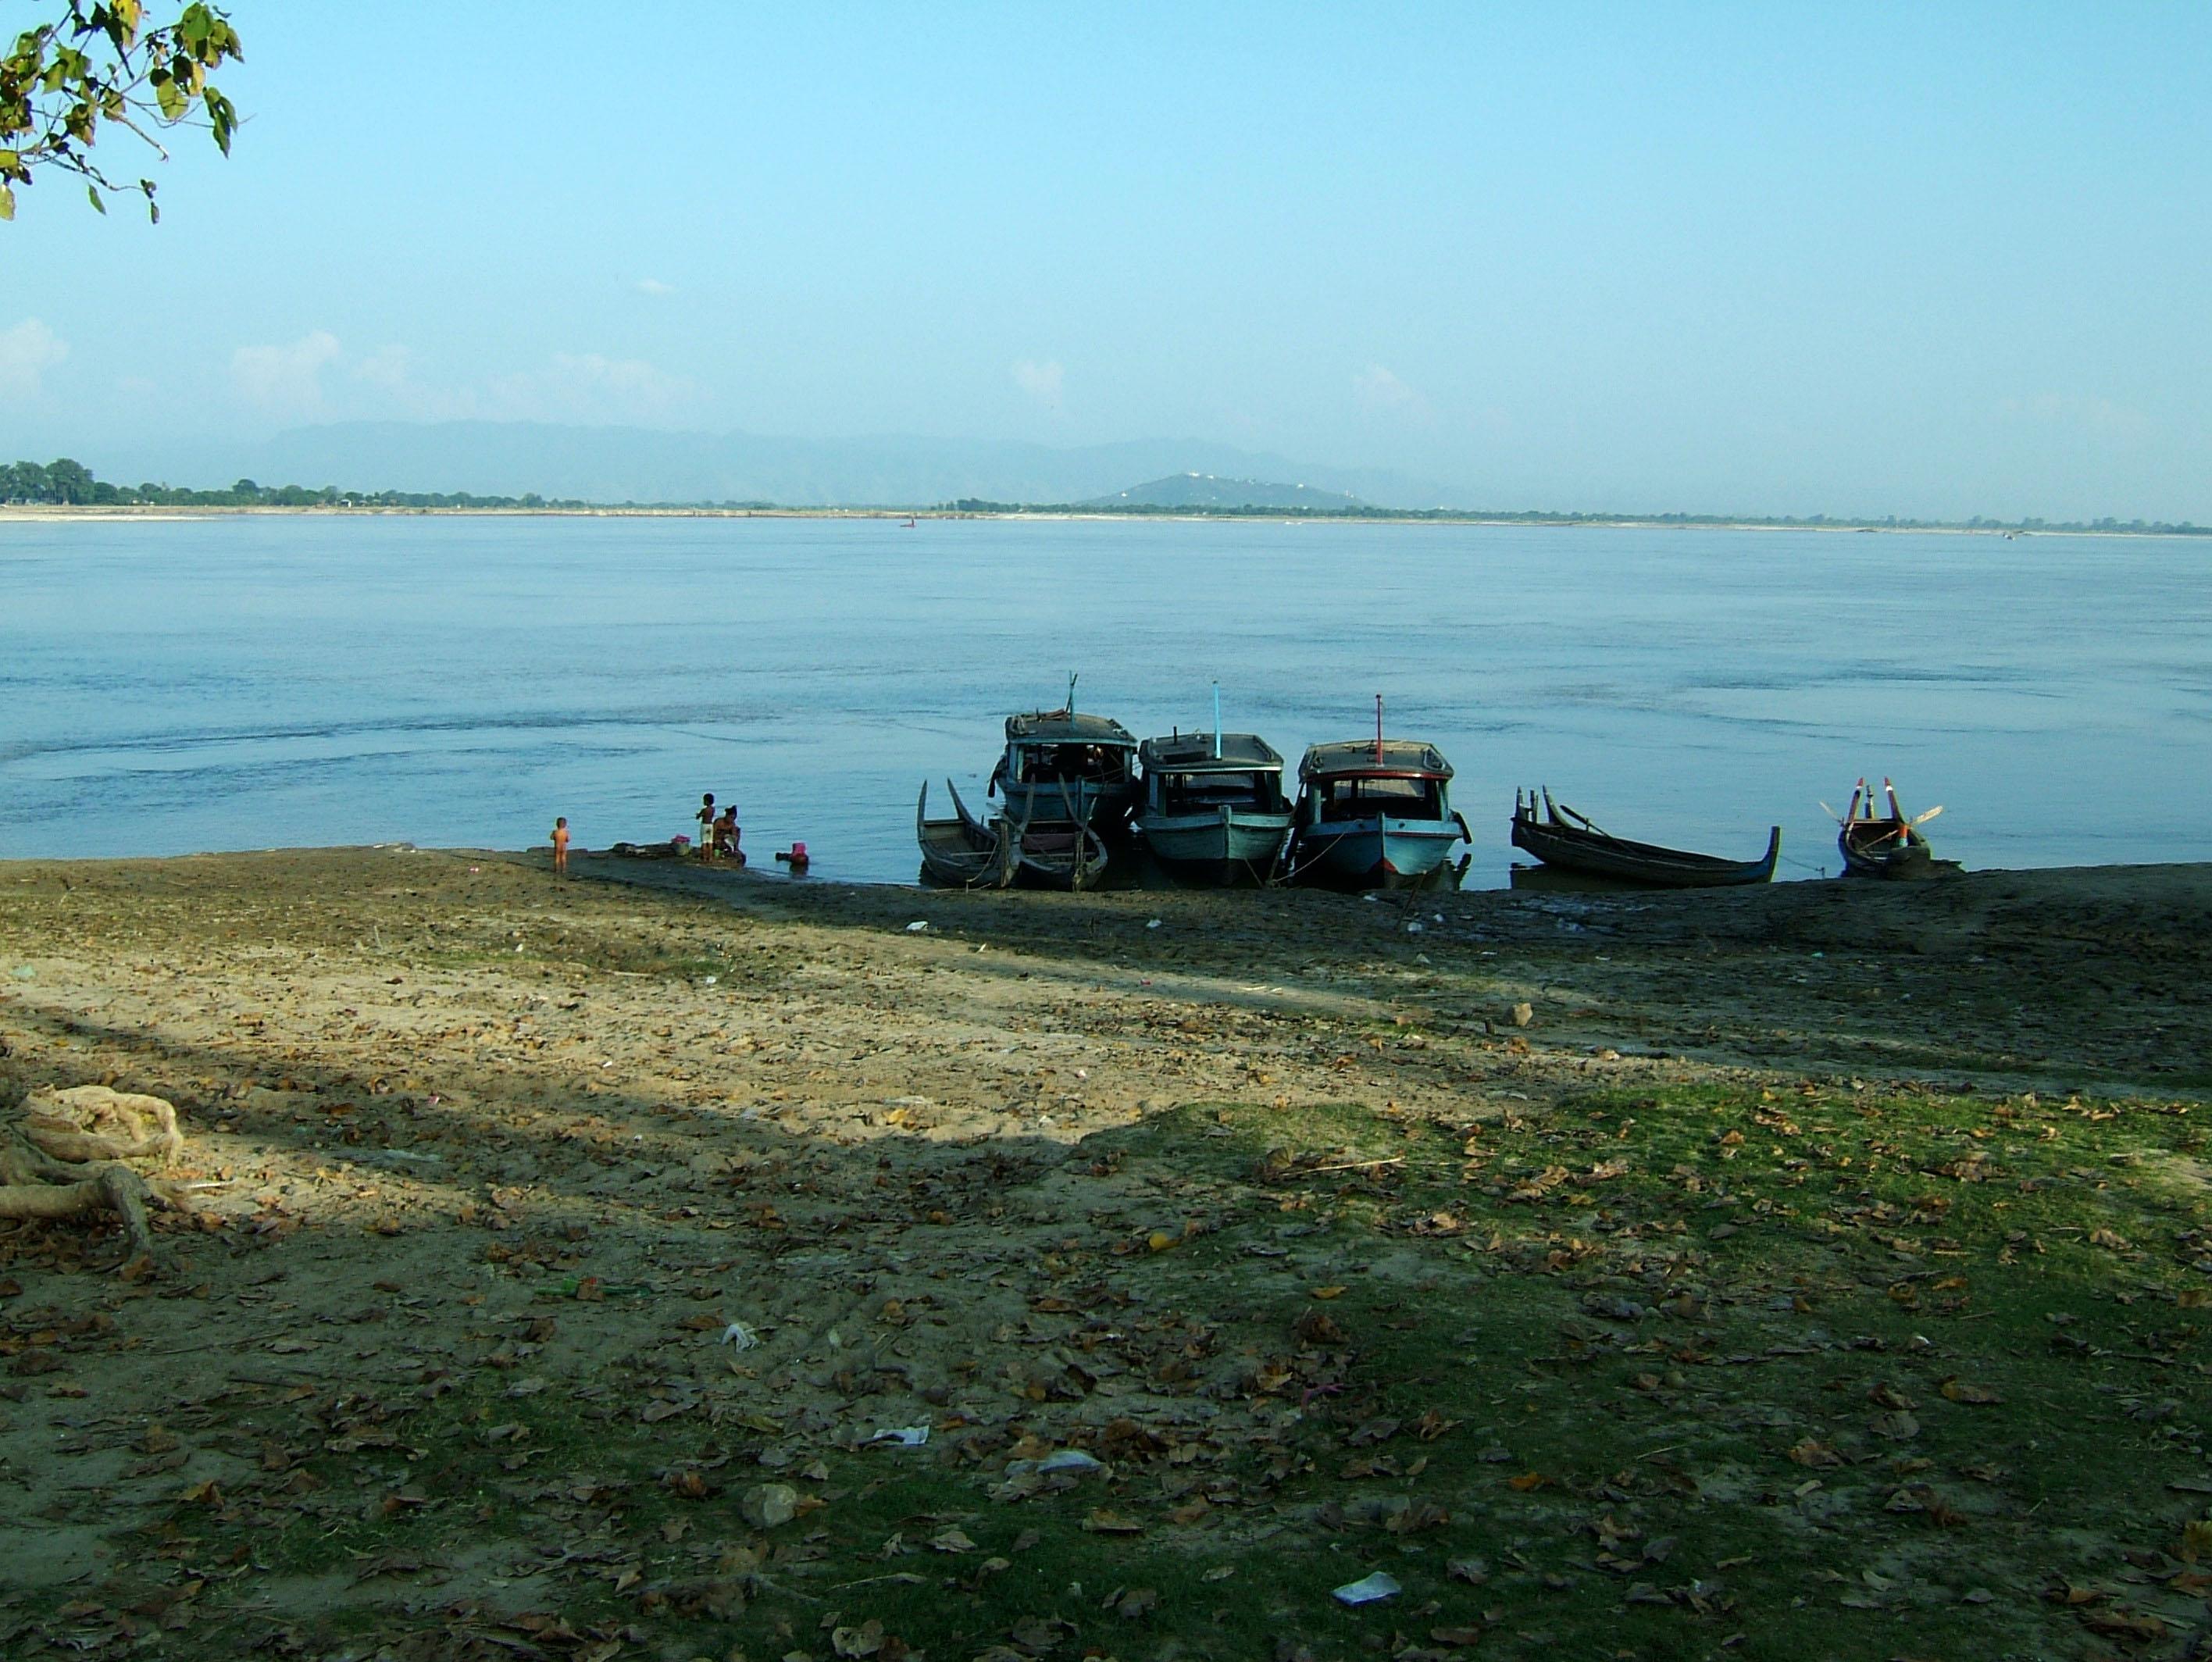 Ayeyarwaddy river scenes Mingun area Nov 2004 12